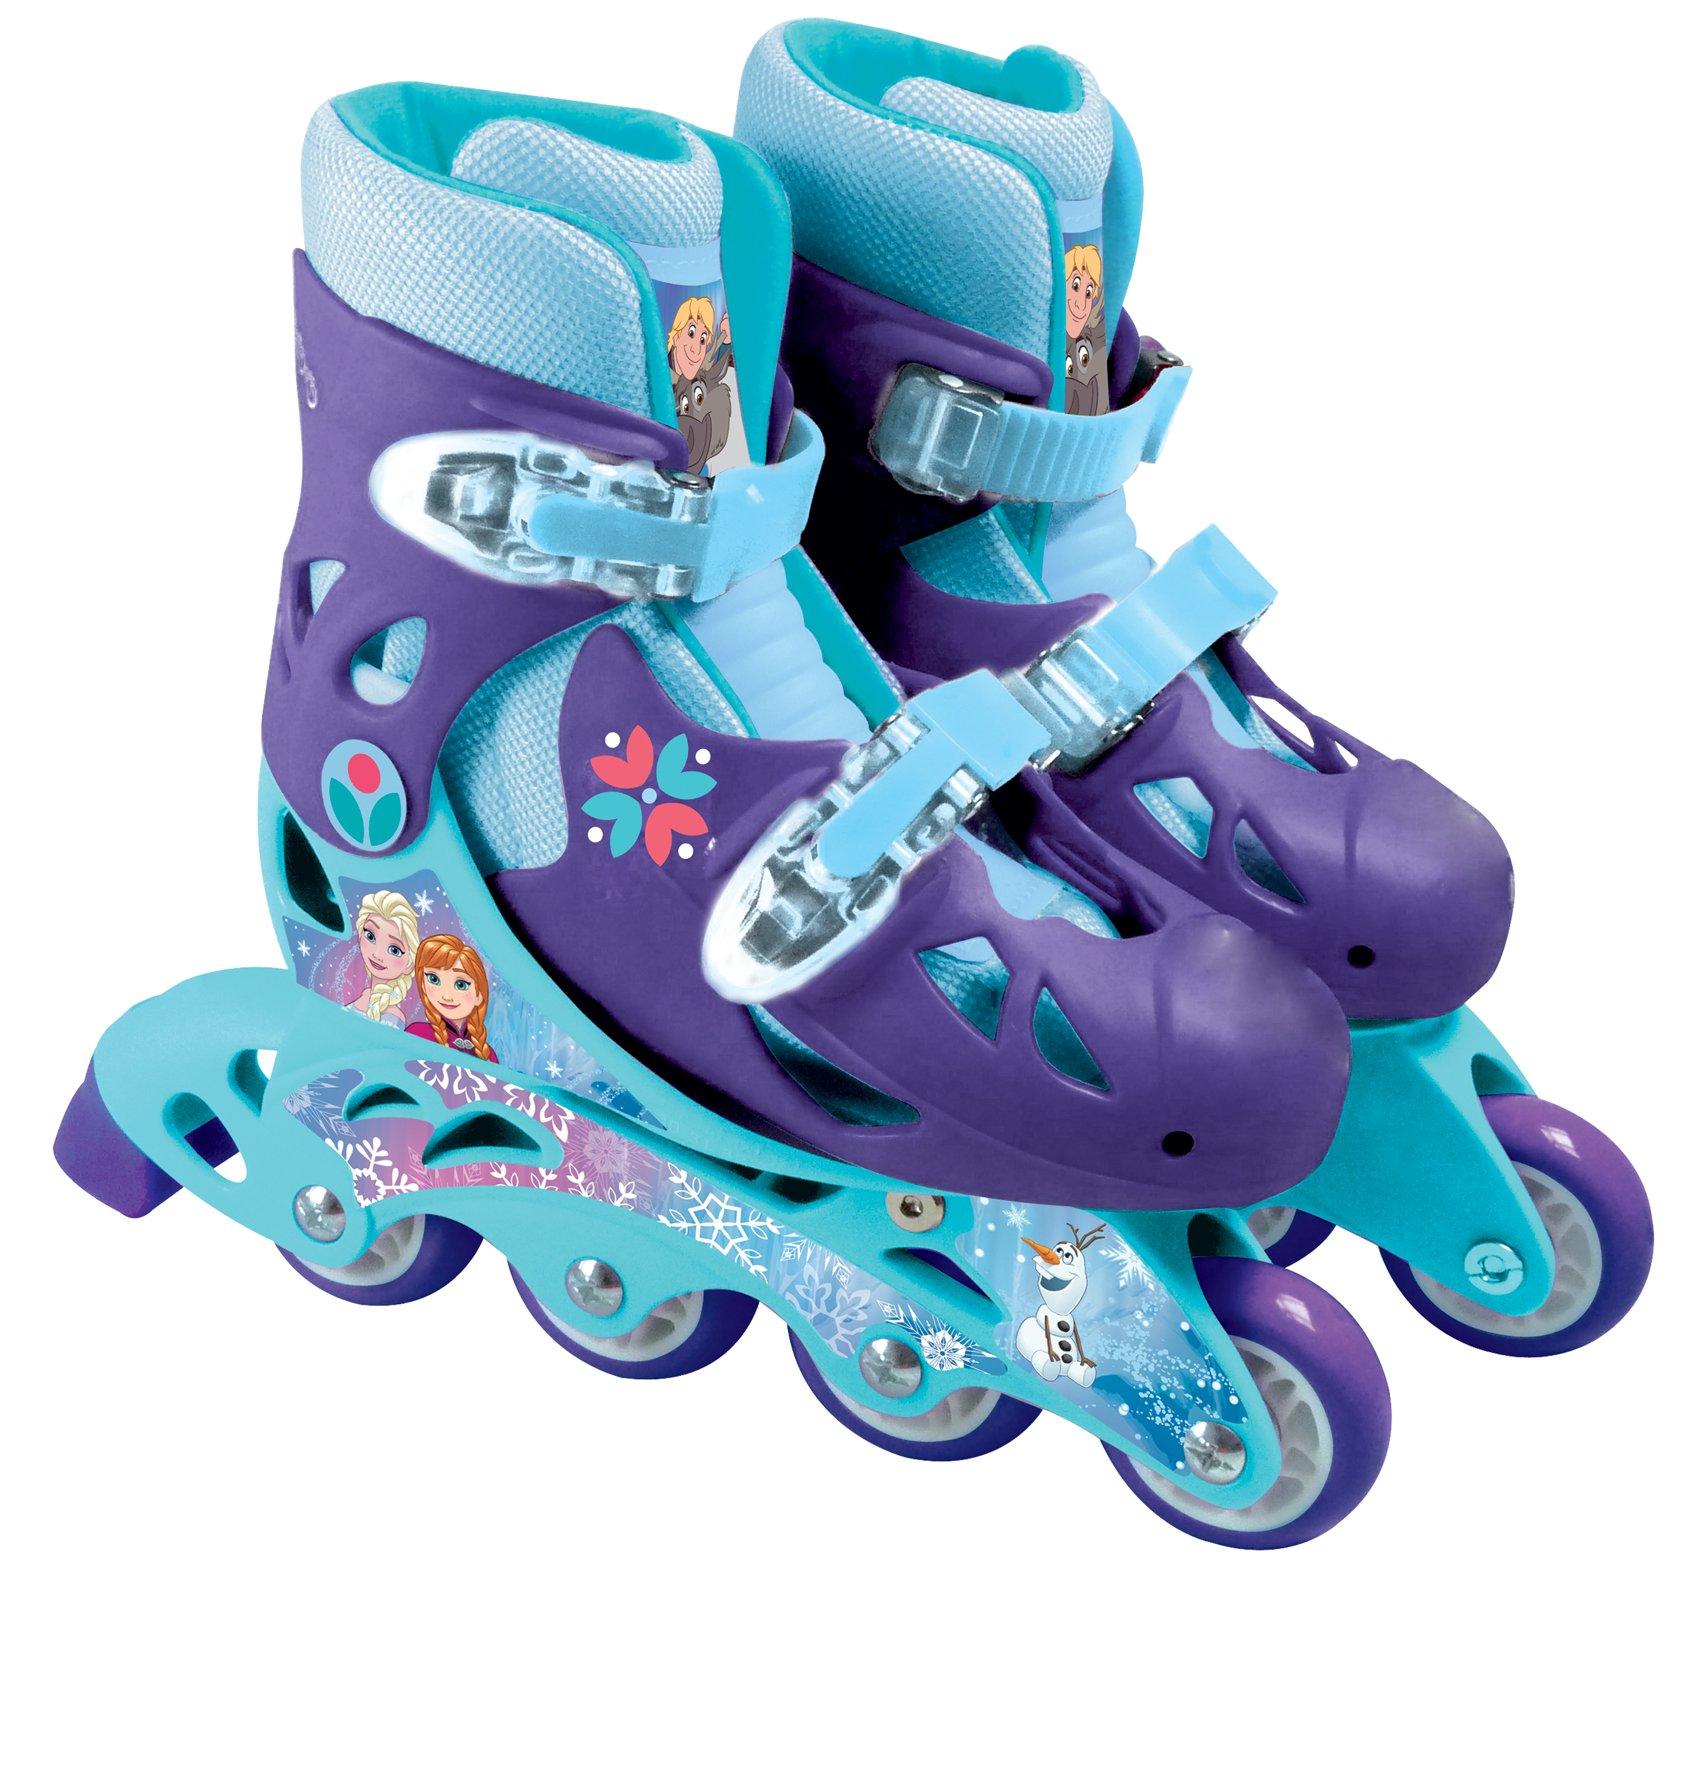 MELIE BIANCO(メリー・ビアンコ) Disney Frozen Inline Roller Skates